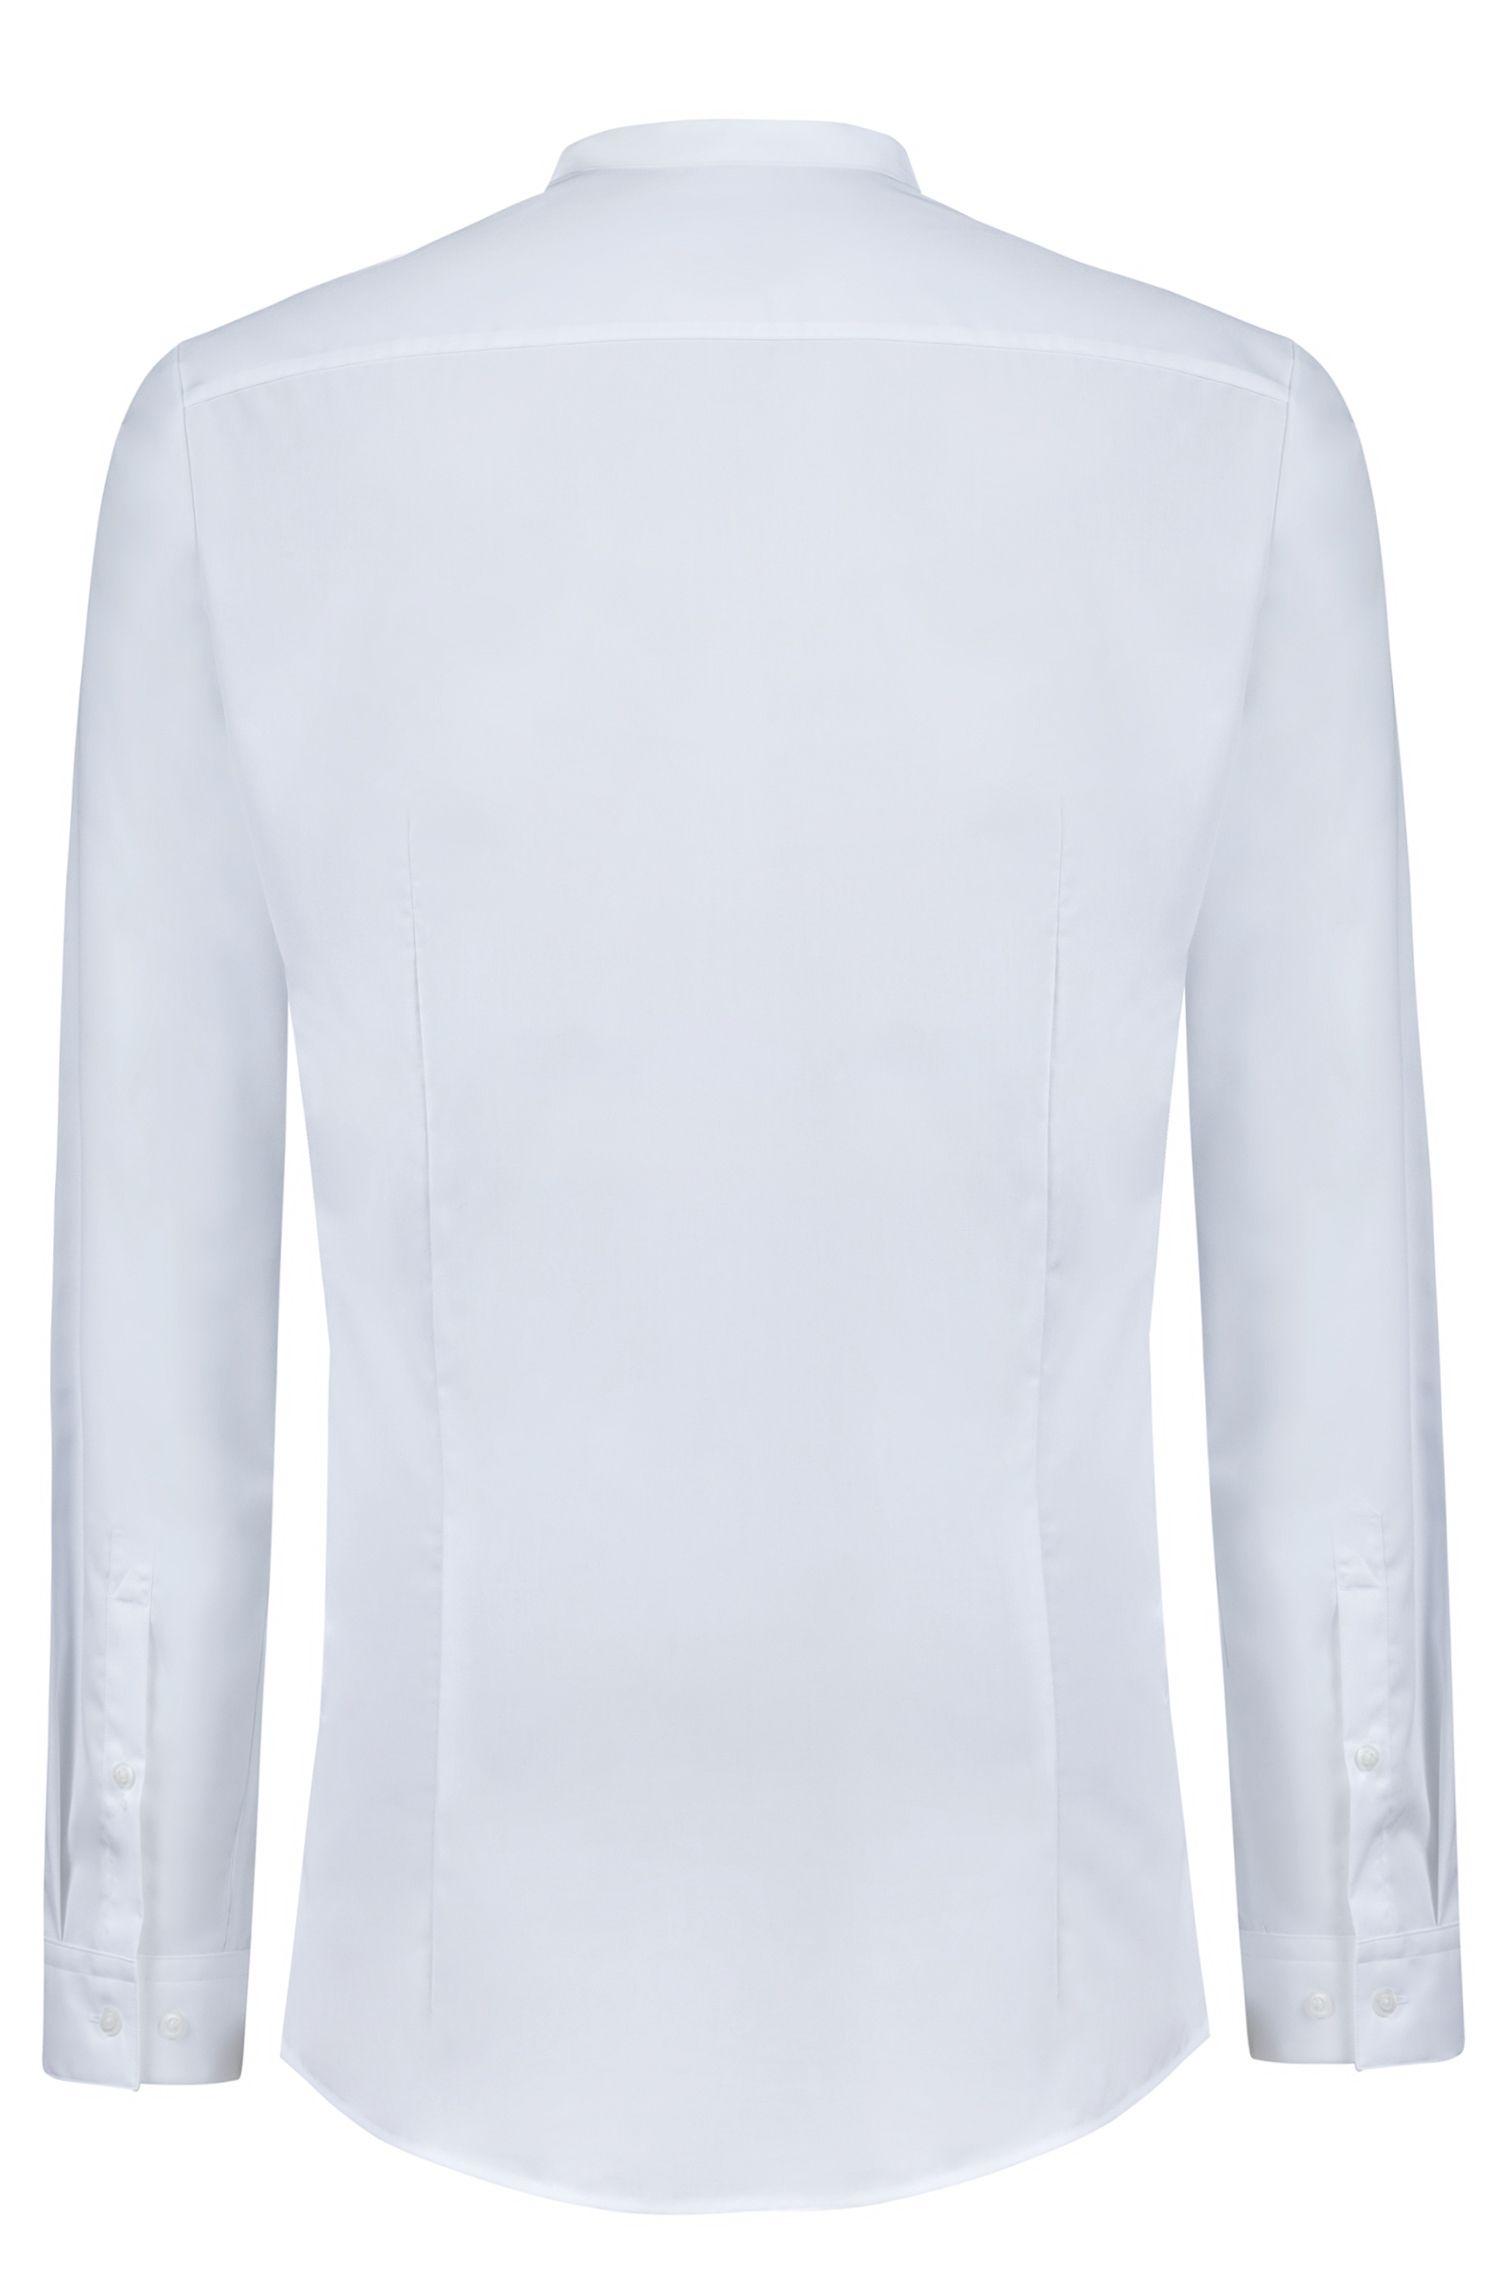 Extra-slim-fit shirt in cotton poplin, White